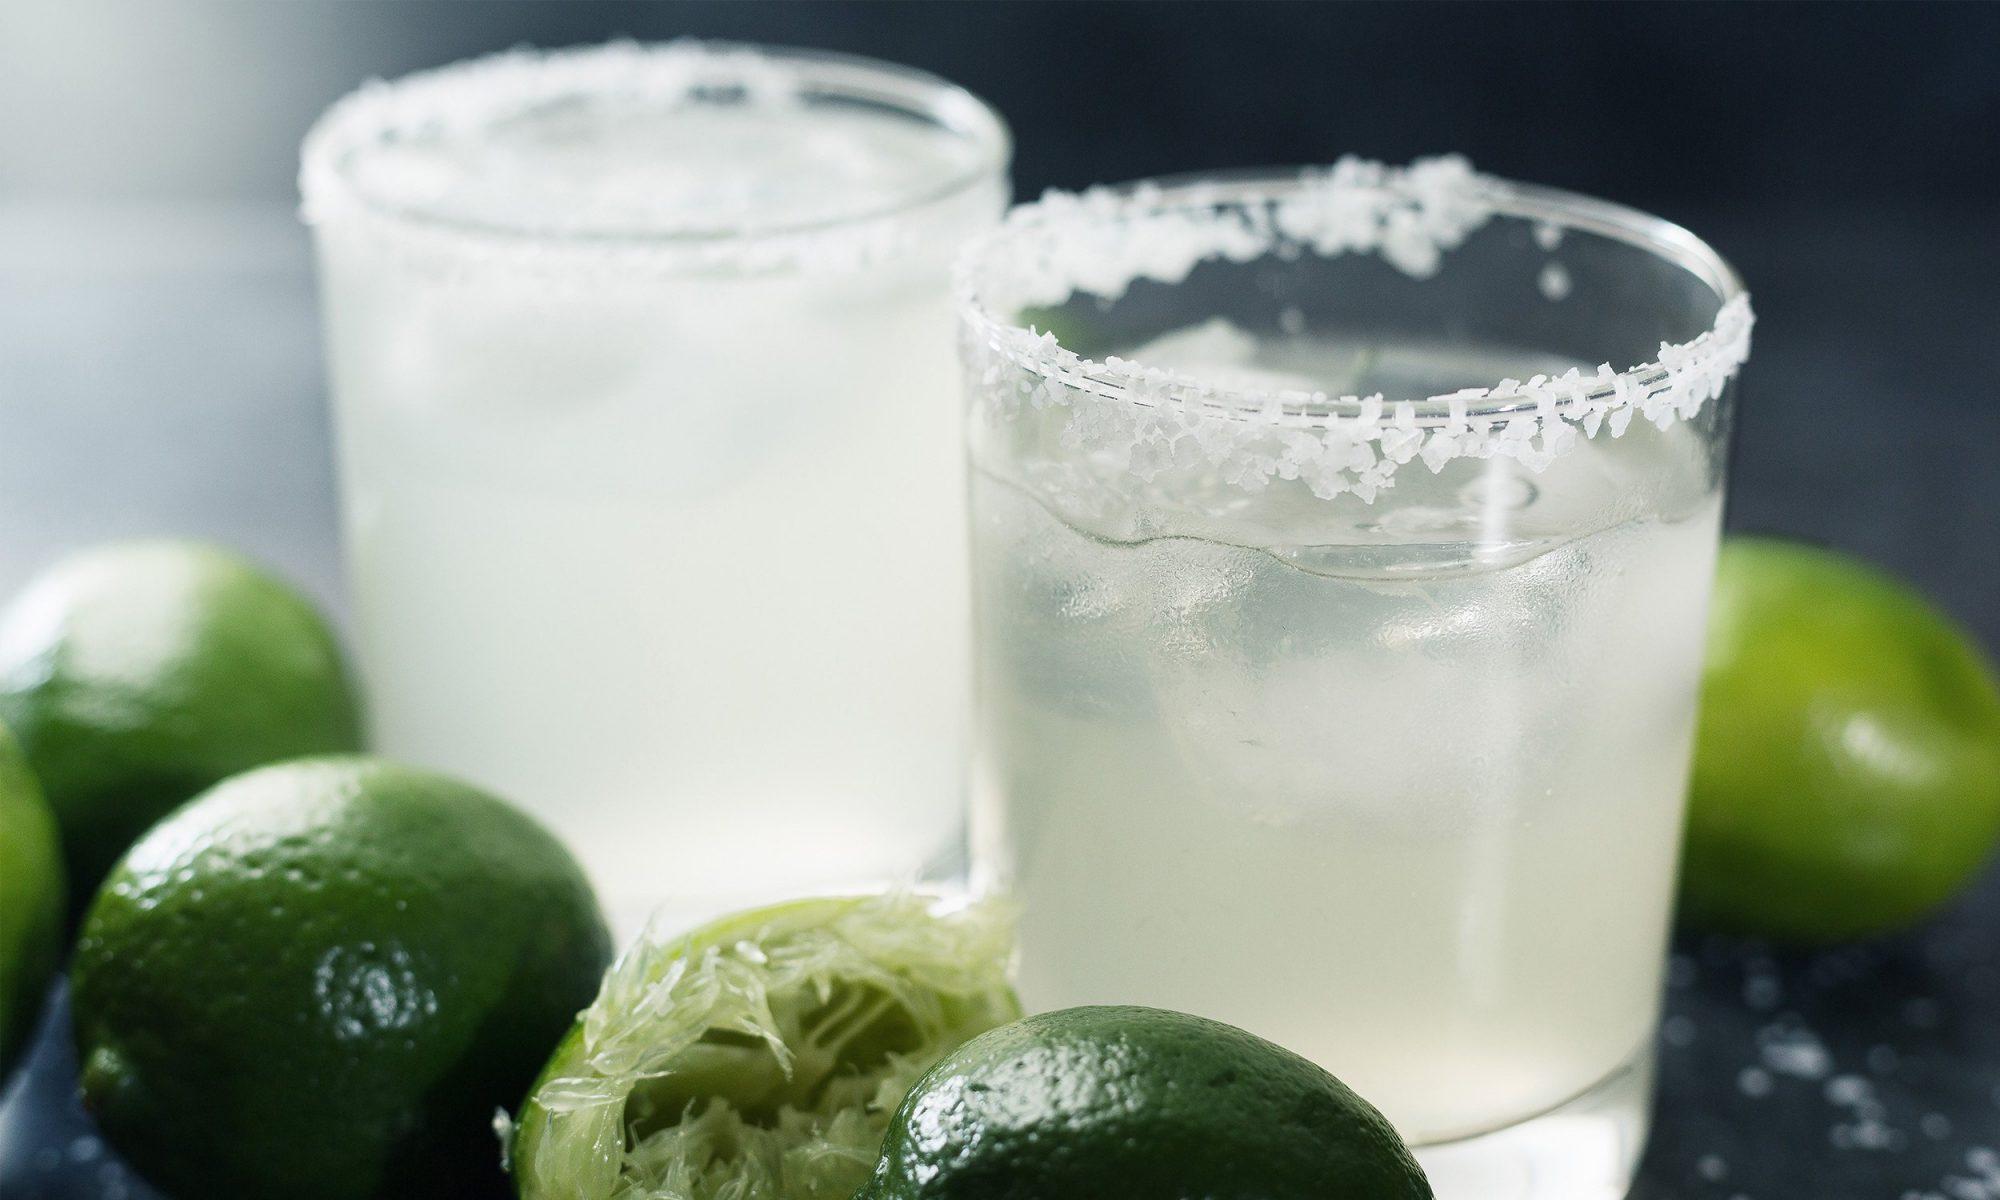 EC: Applebee's Employee Reveals Their $1 Margaritas Are Mostly Water